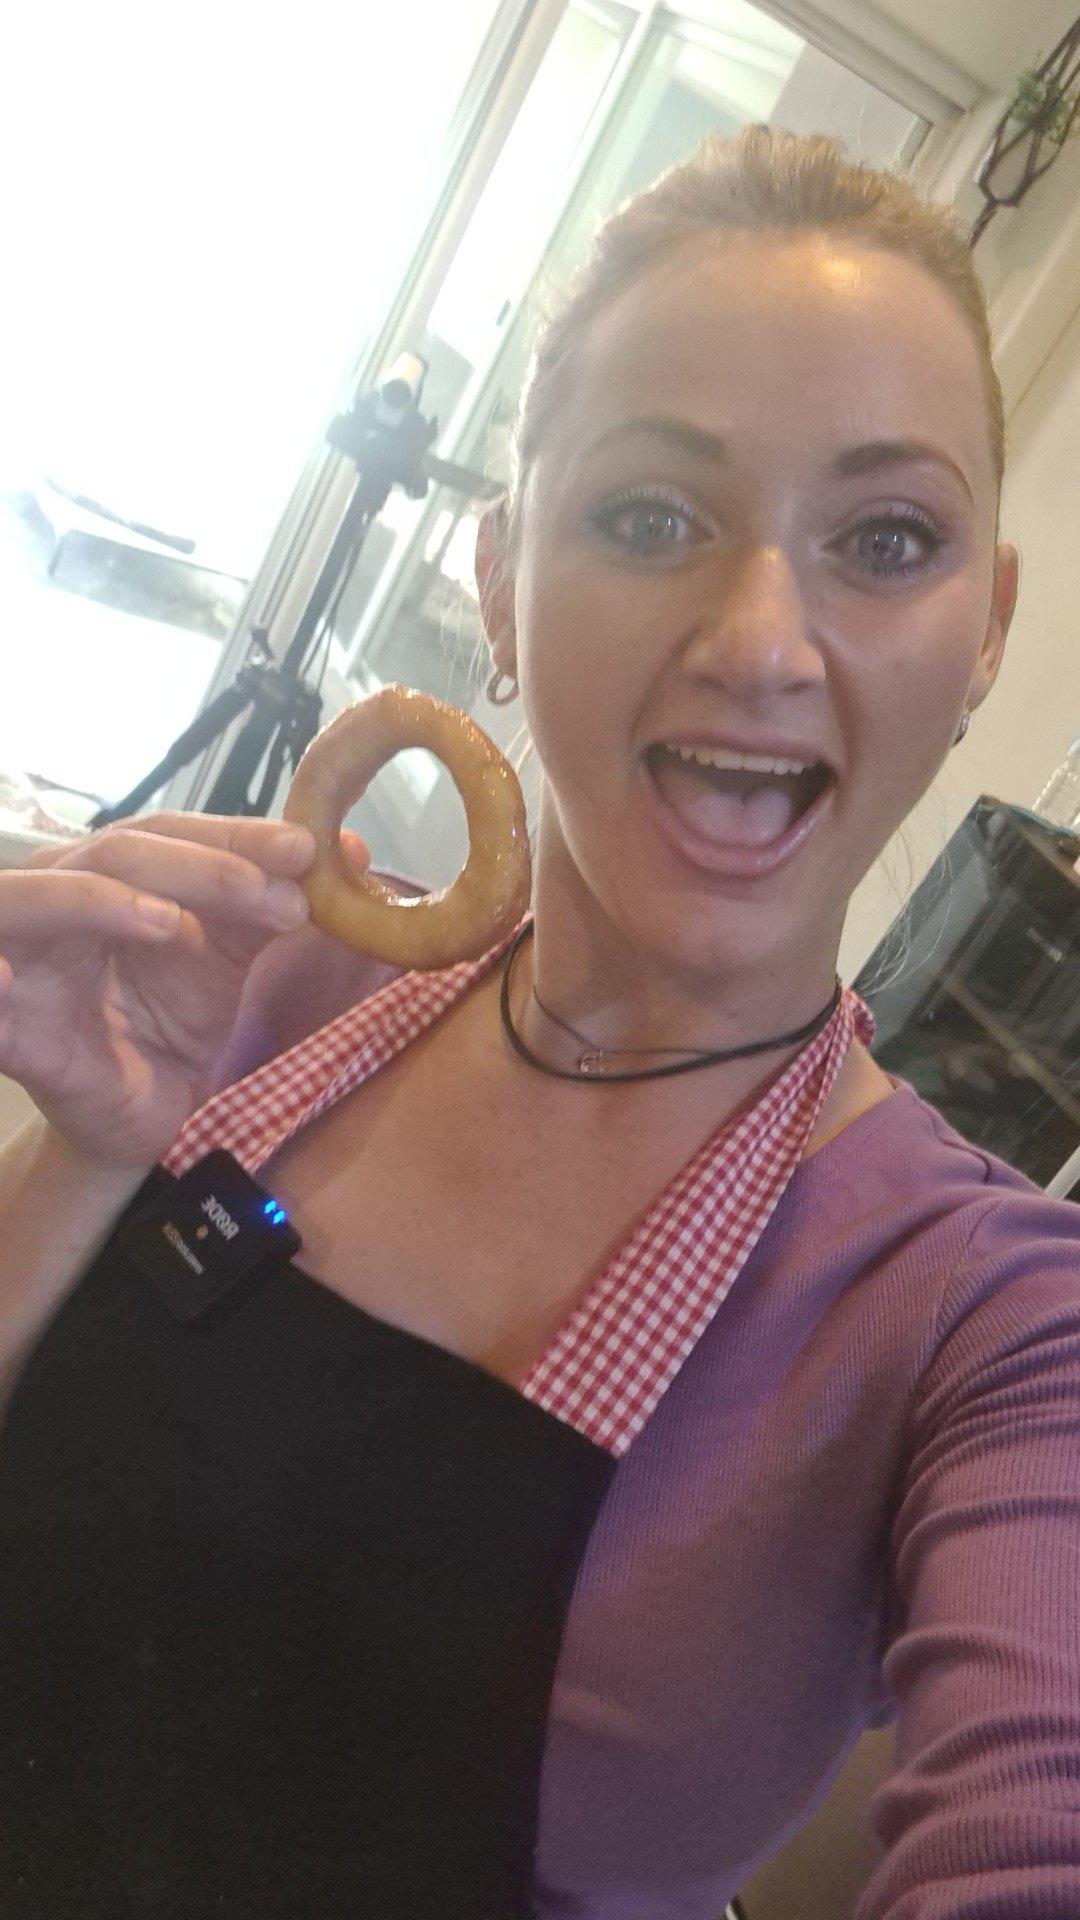 rt-splucy-like-my-onion-rings-i-mean-donutskitchenfail-makingdonuts-ortryingto-https-t-co-rrl73zl4as